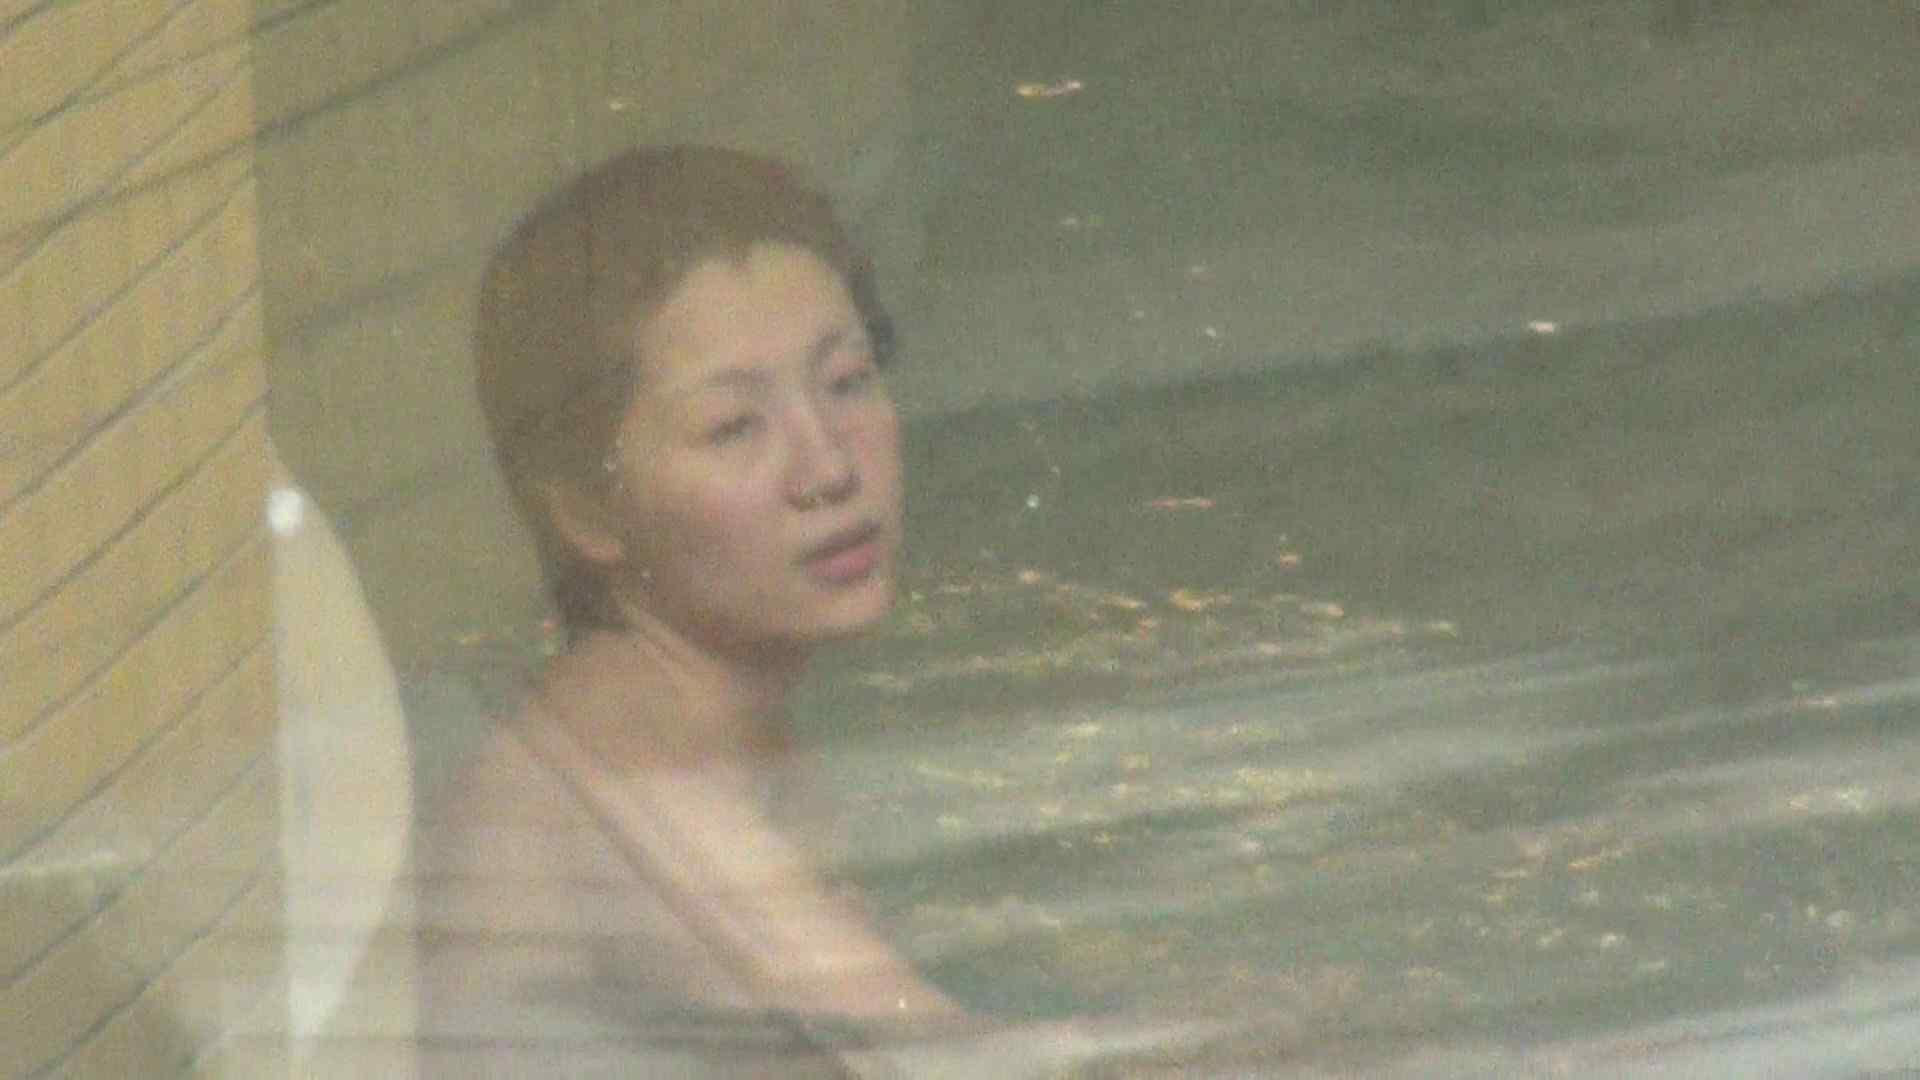 Aquaな露天風呂Vol.241 露天風呂編  89PIX 10